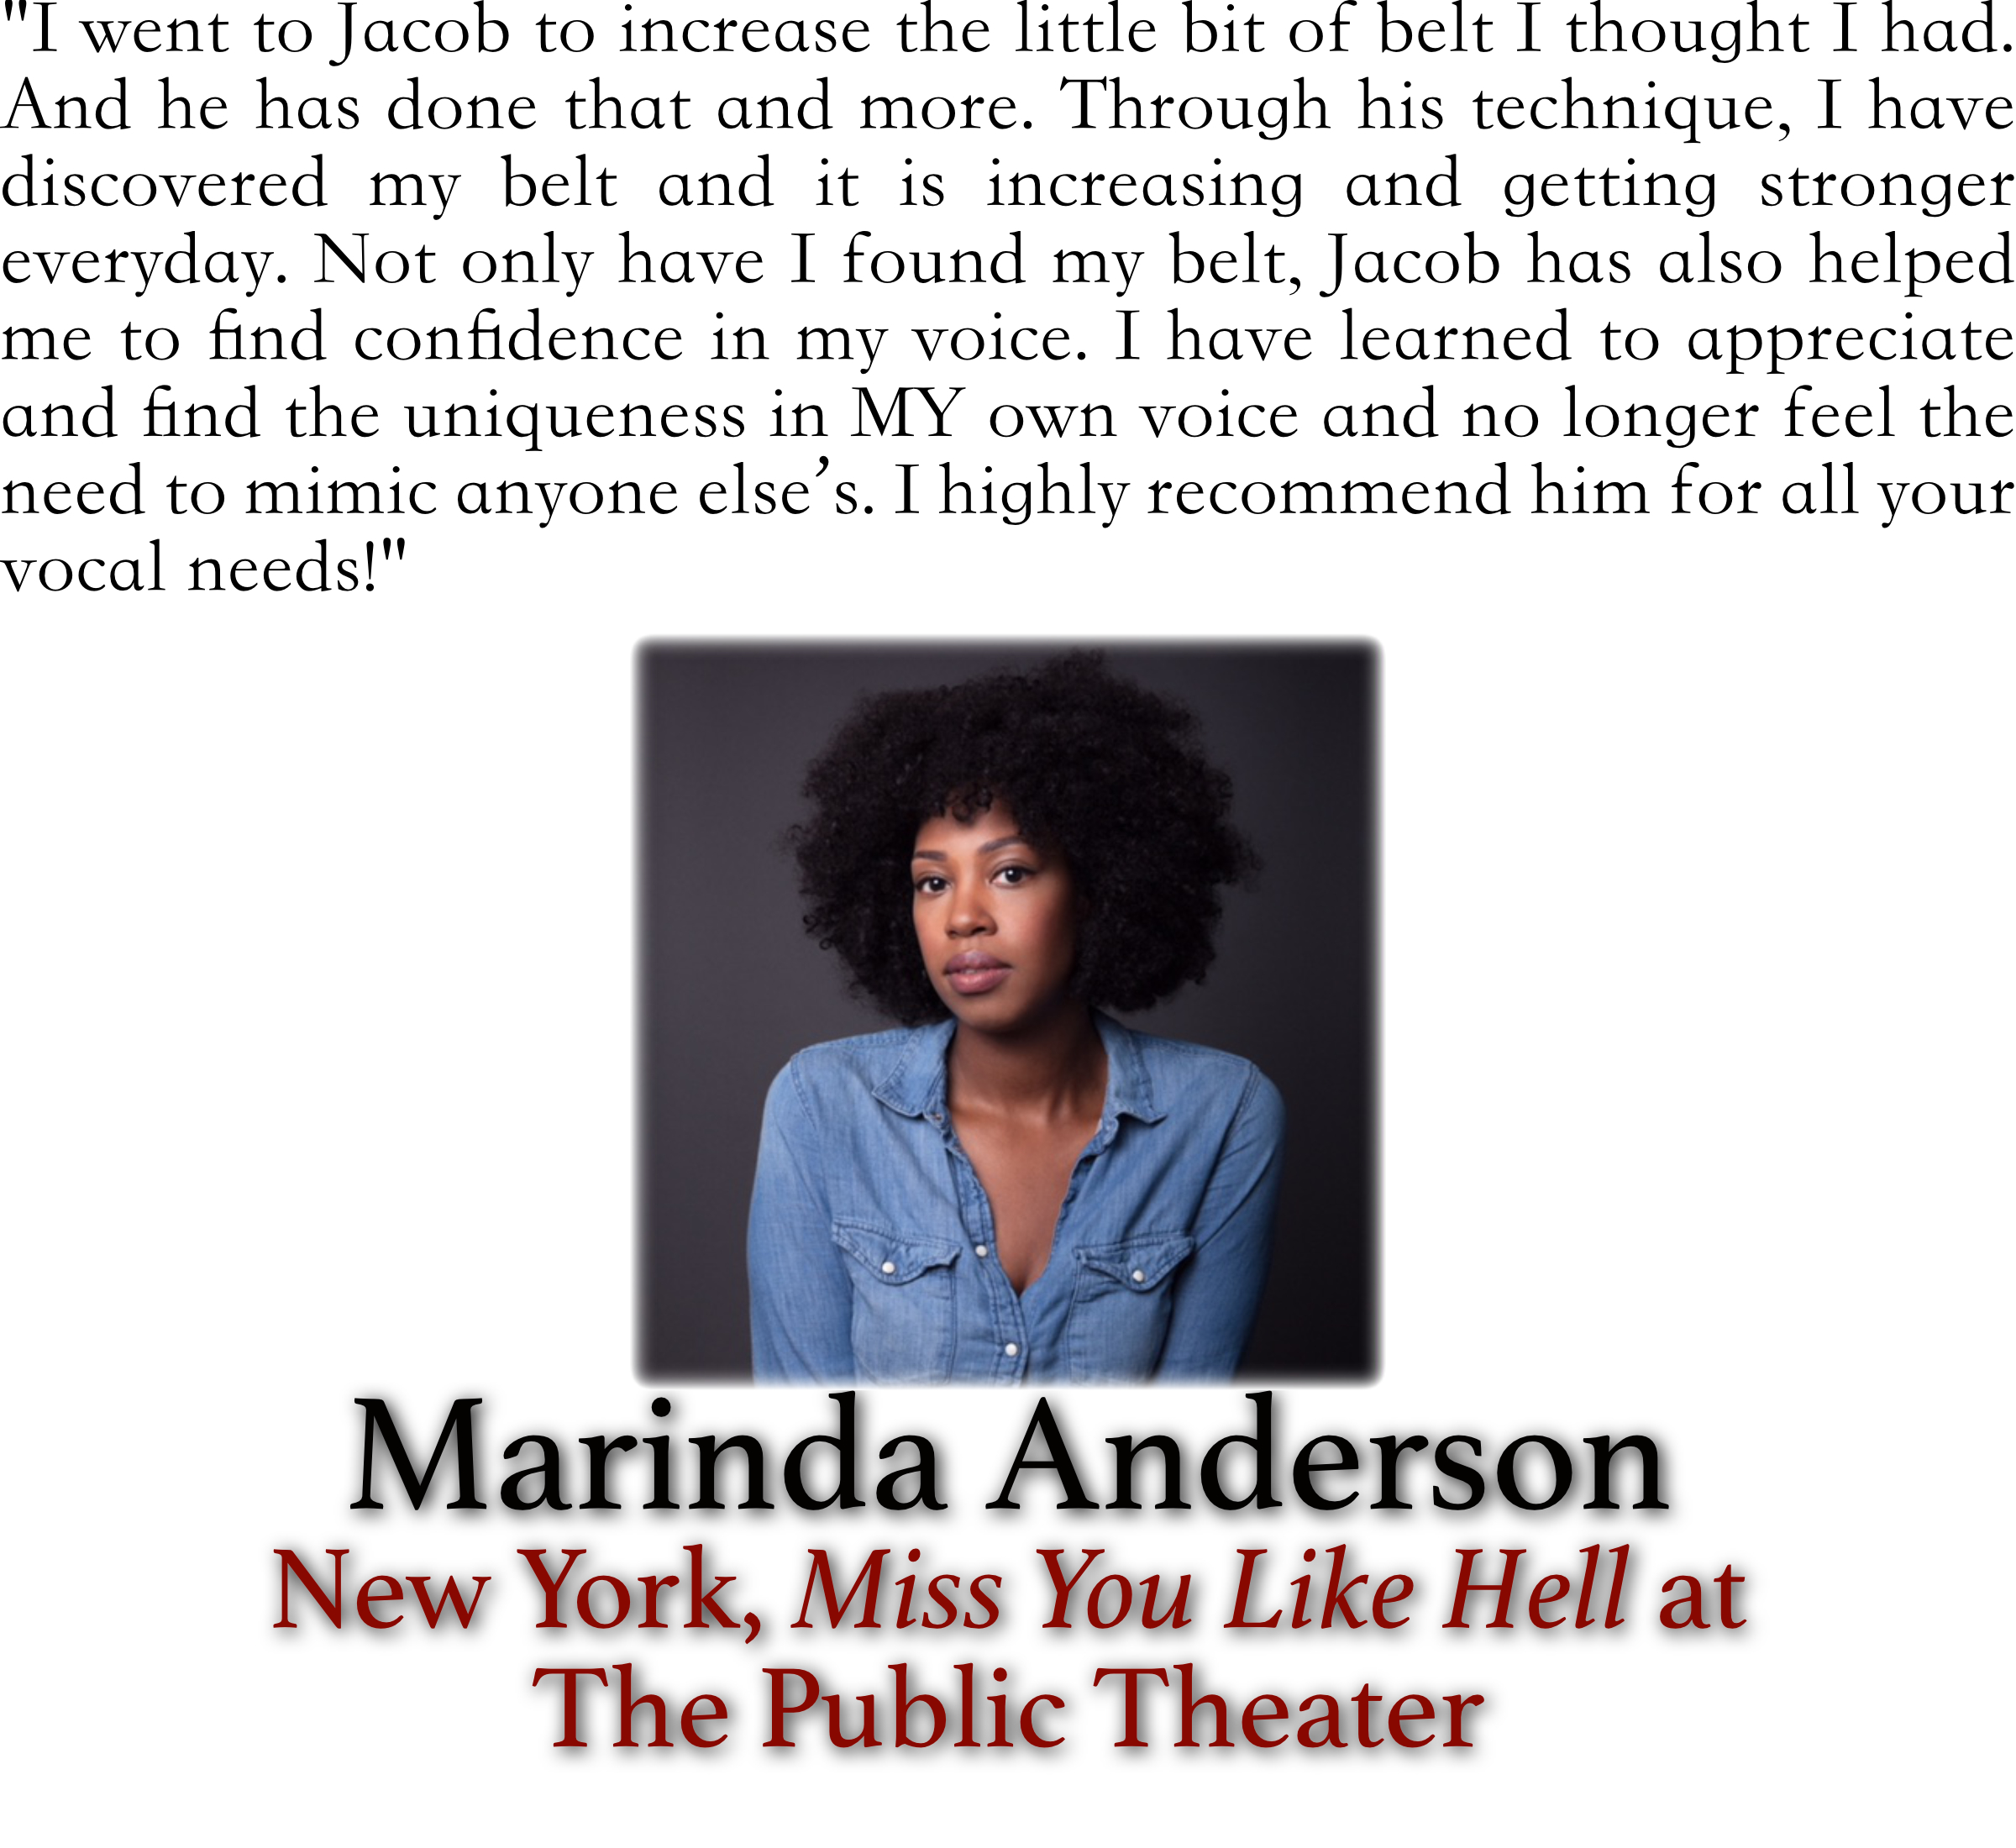 Marinda Anderson Testimonial.jpg